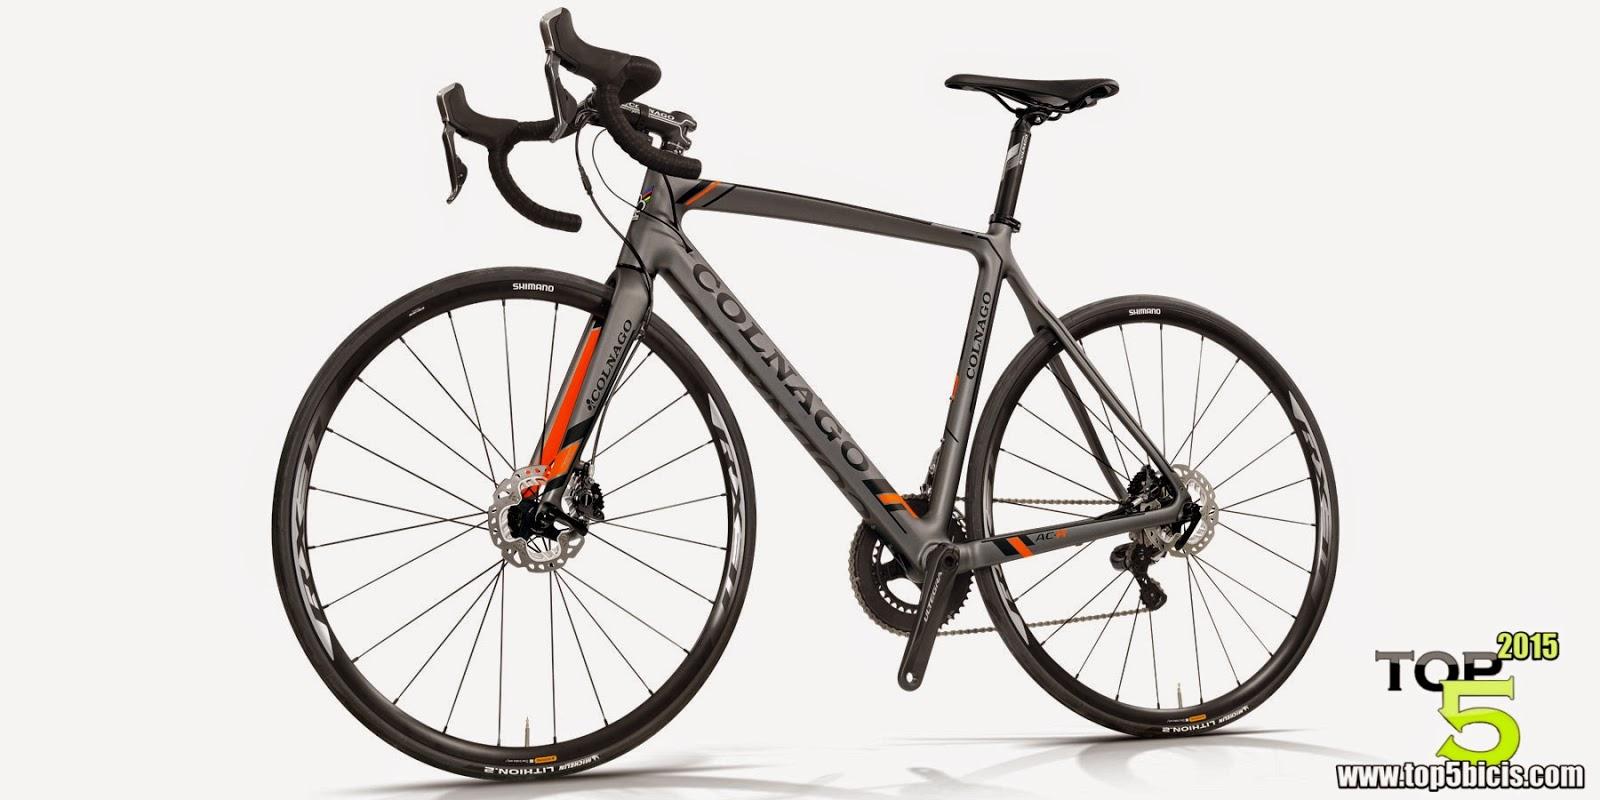 Top 5 Bicicletas De Carretera Colnago Ac R Alto